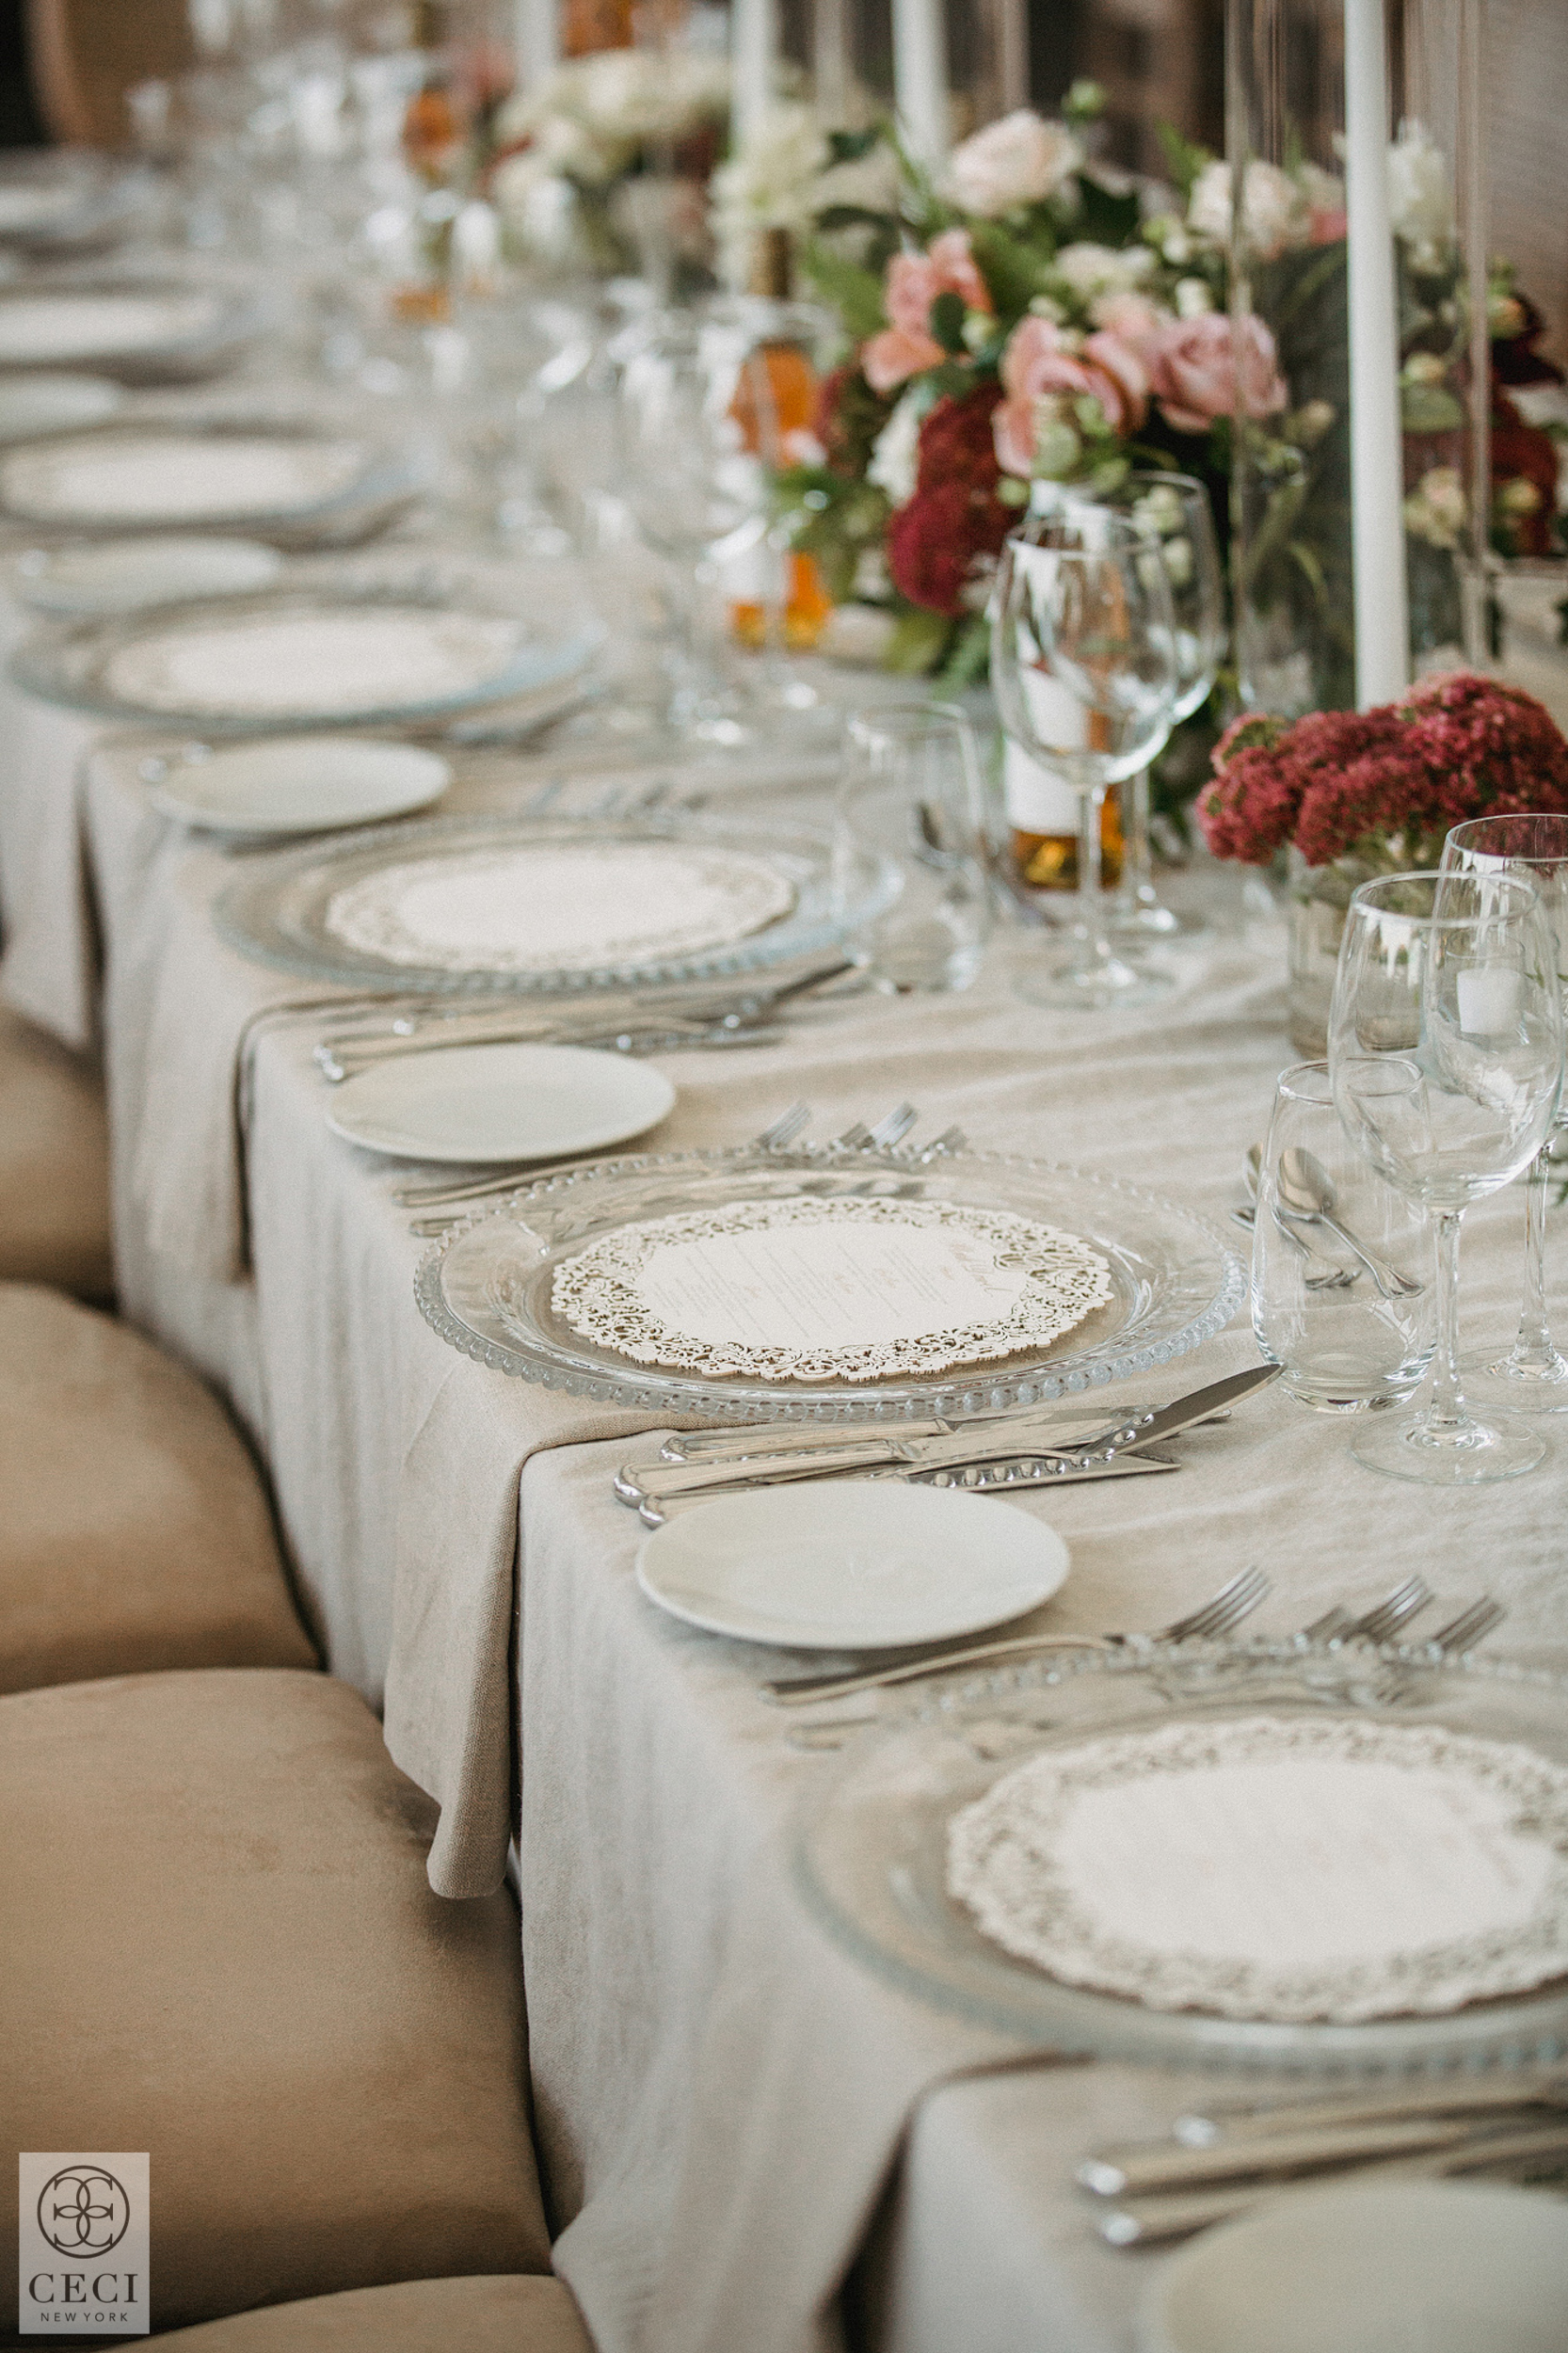 Ceci_New_York_Custom_Luxury_Wedding_BeautyShot_LaserCut_Stationery_Personalized_Couture_Foil_Stamping_Perth_Destination_Australia_Chic_-8.jpg